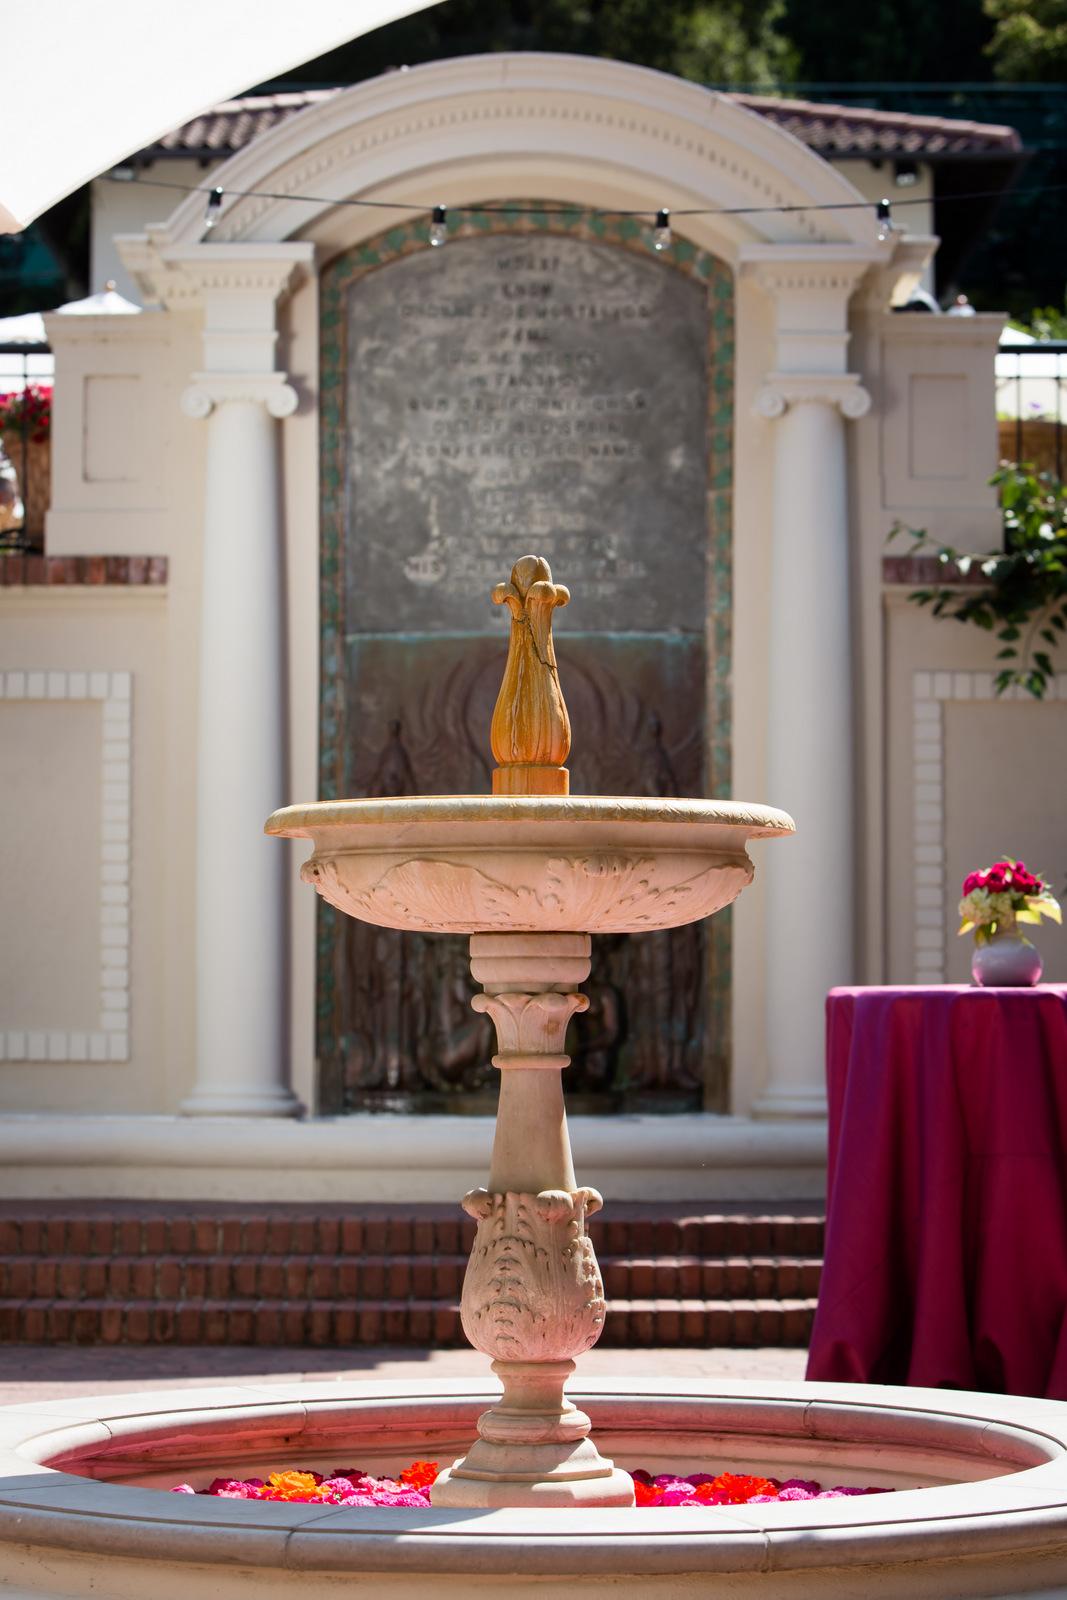 zac-fountain2.jpg